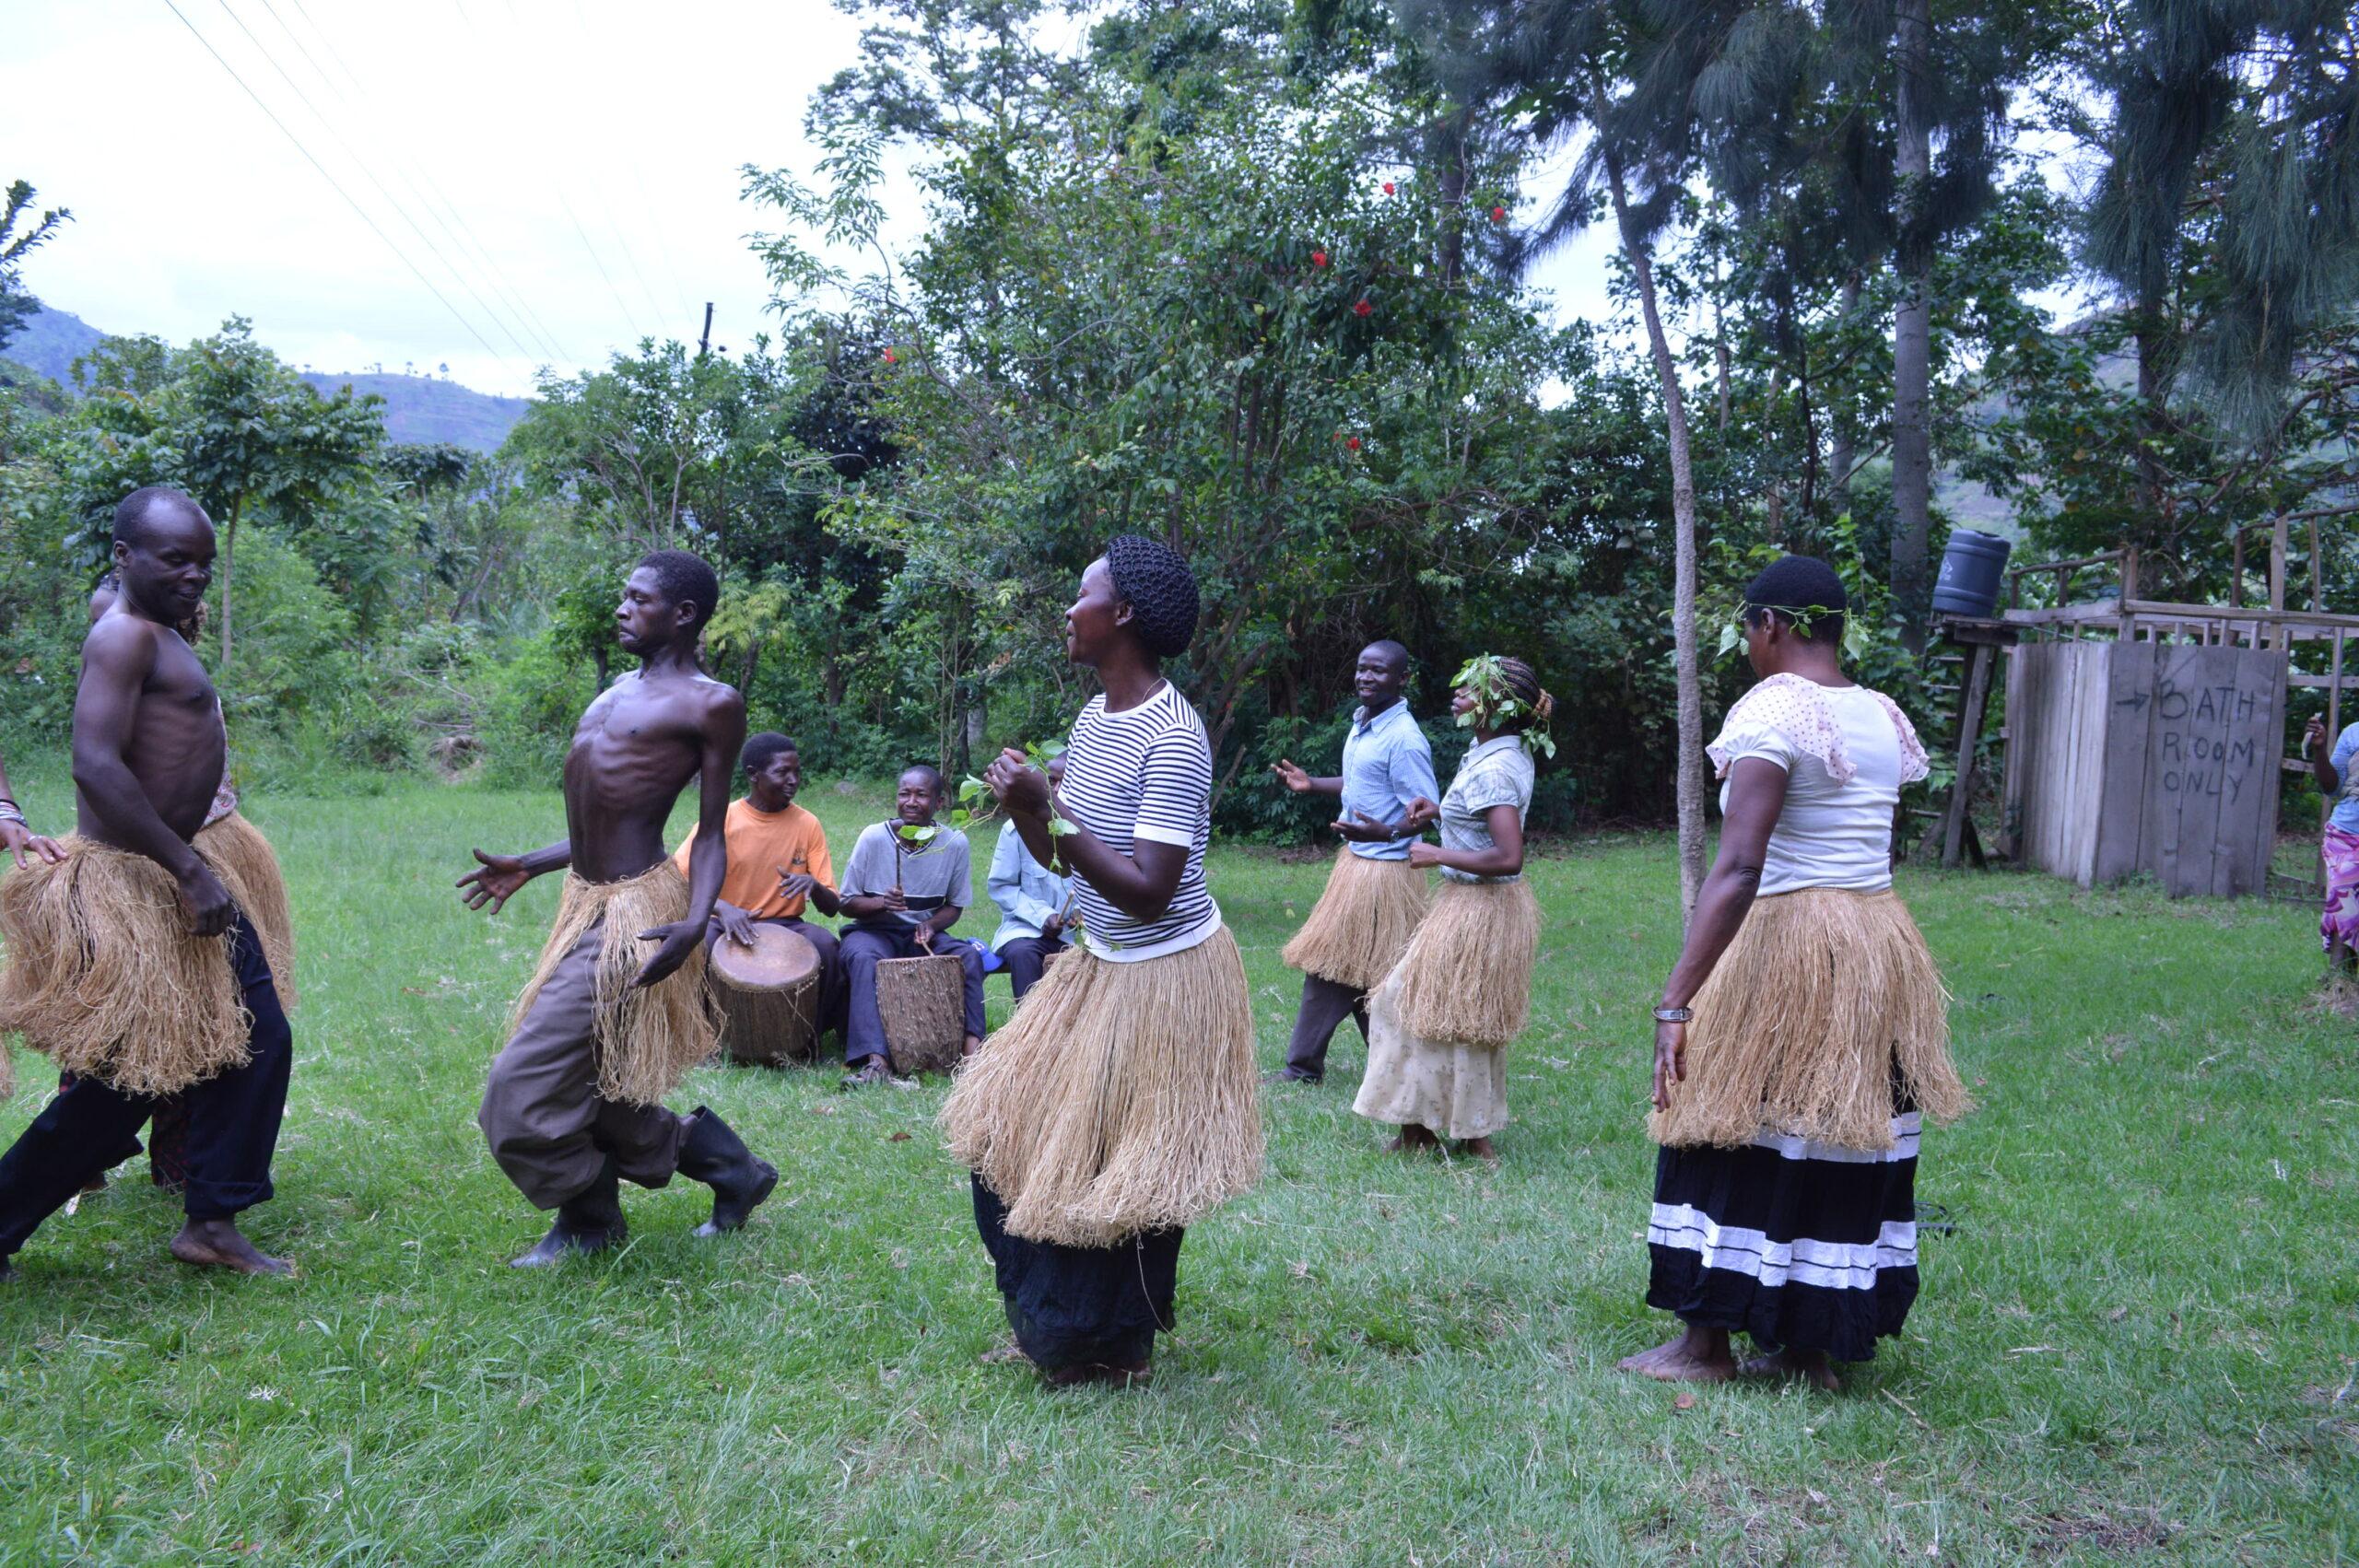 traditonal dance performance